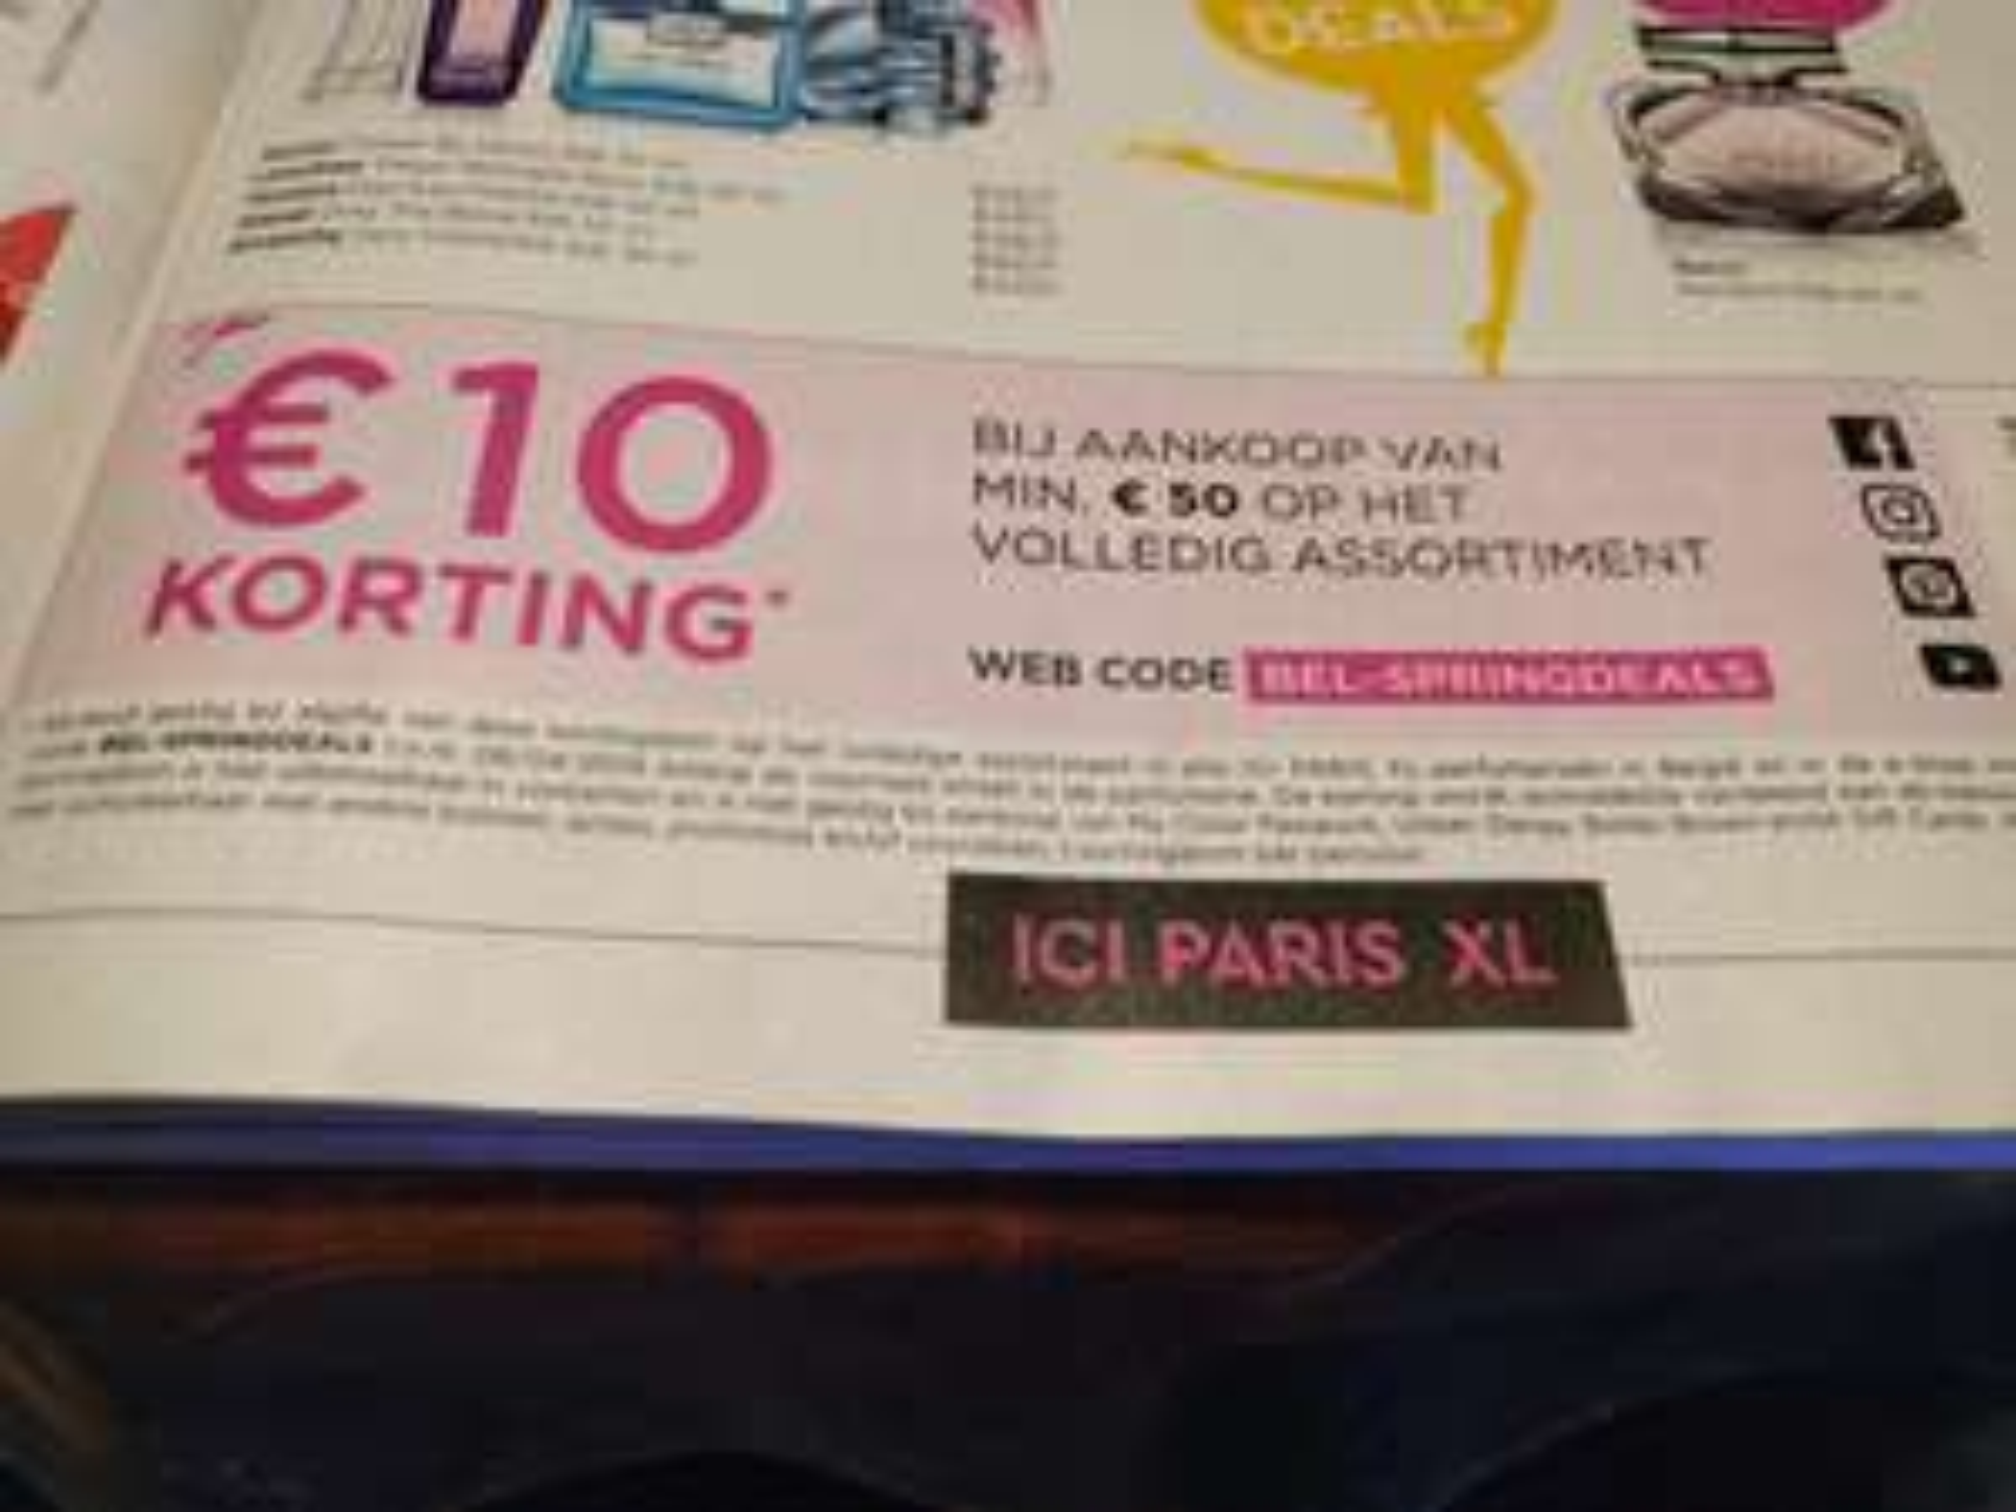 [BELGIË] 10 euro korting vanaf 50 euro ICI PARIS XL